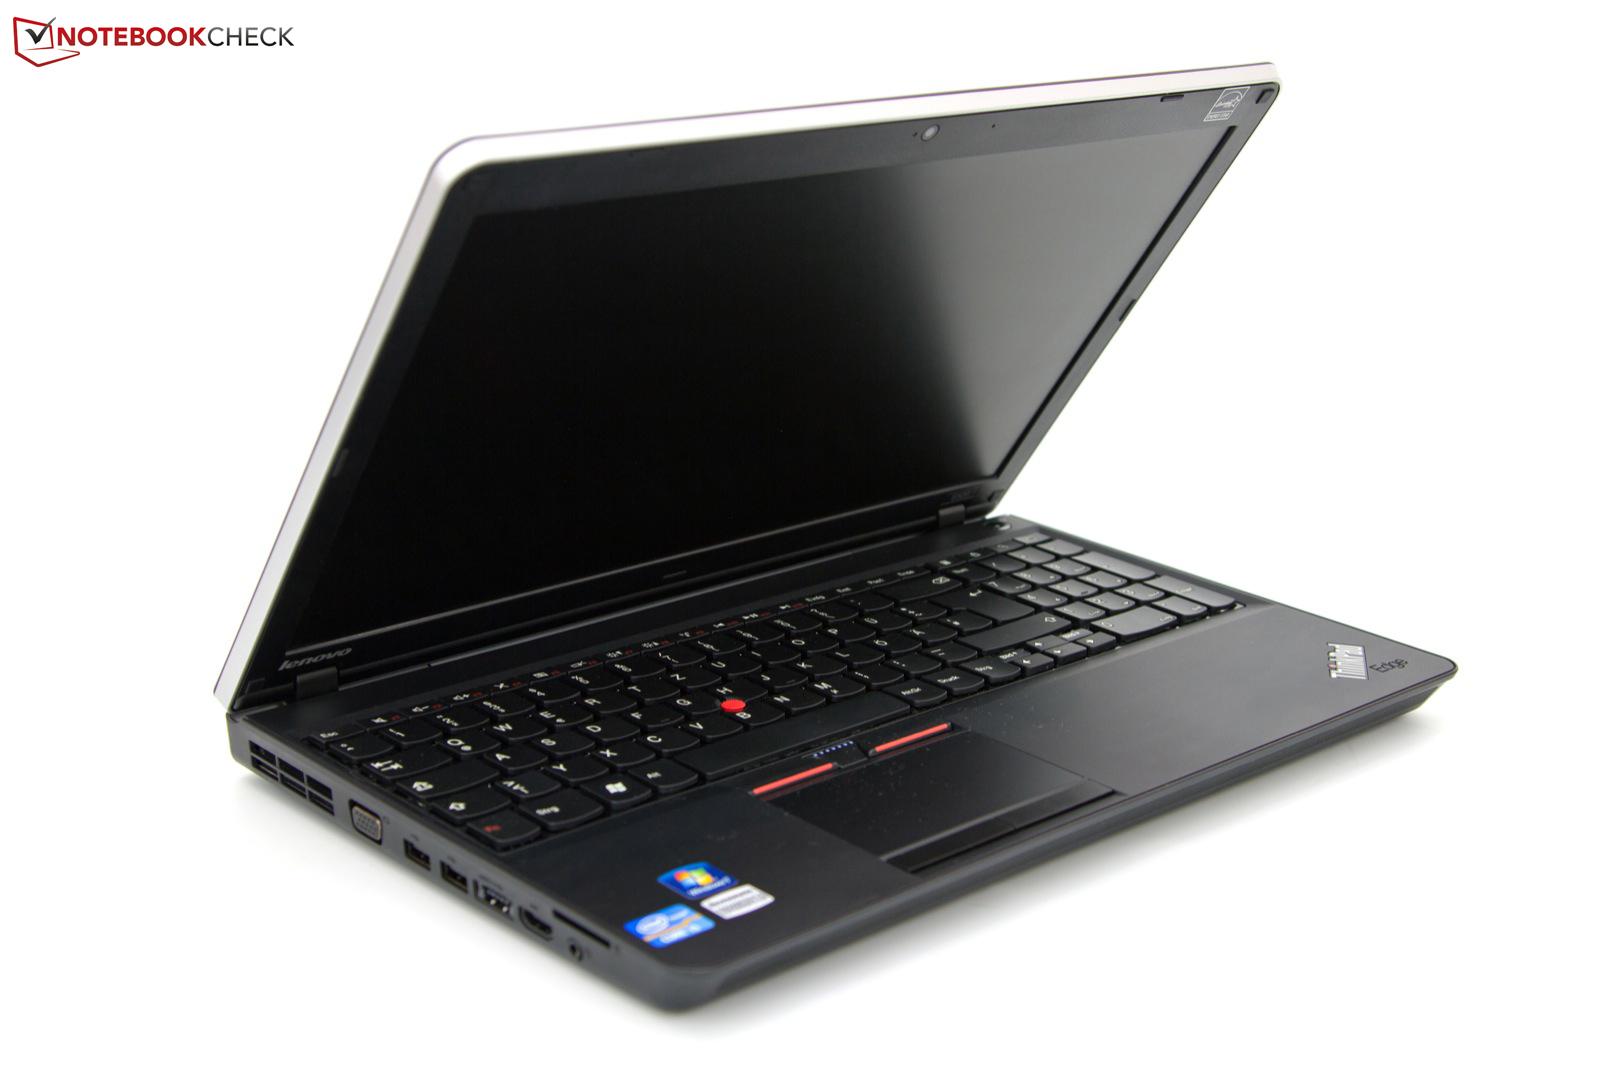 GIAUSA 11.1V 45N1102 battery for Lenovo thinkPad Helix